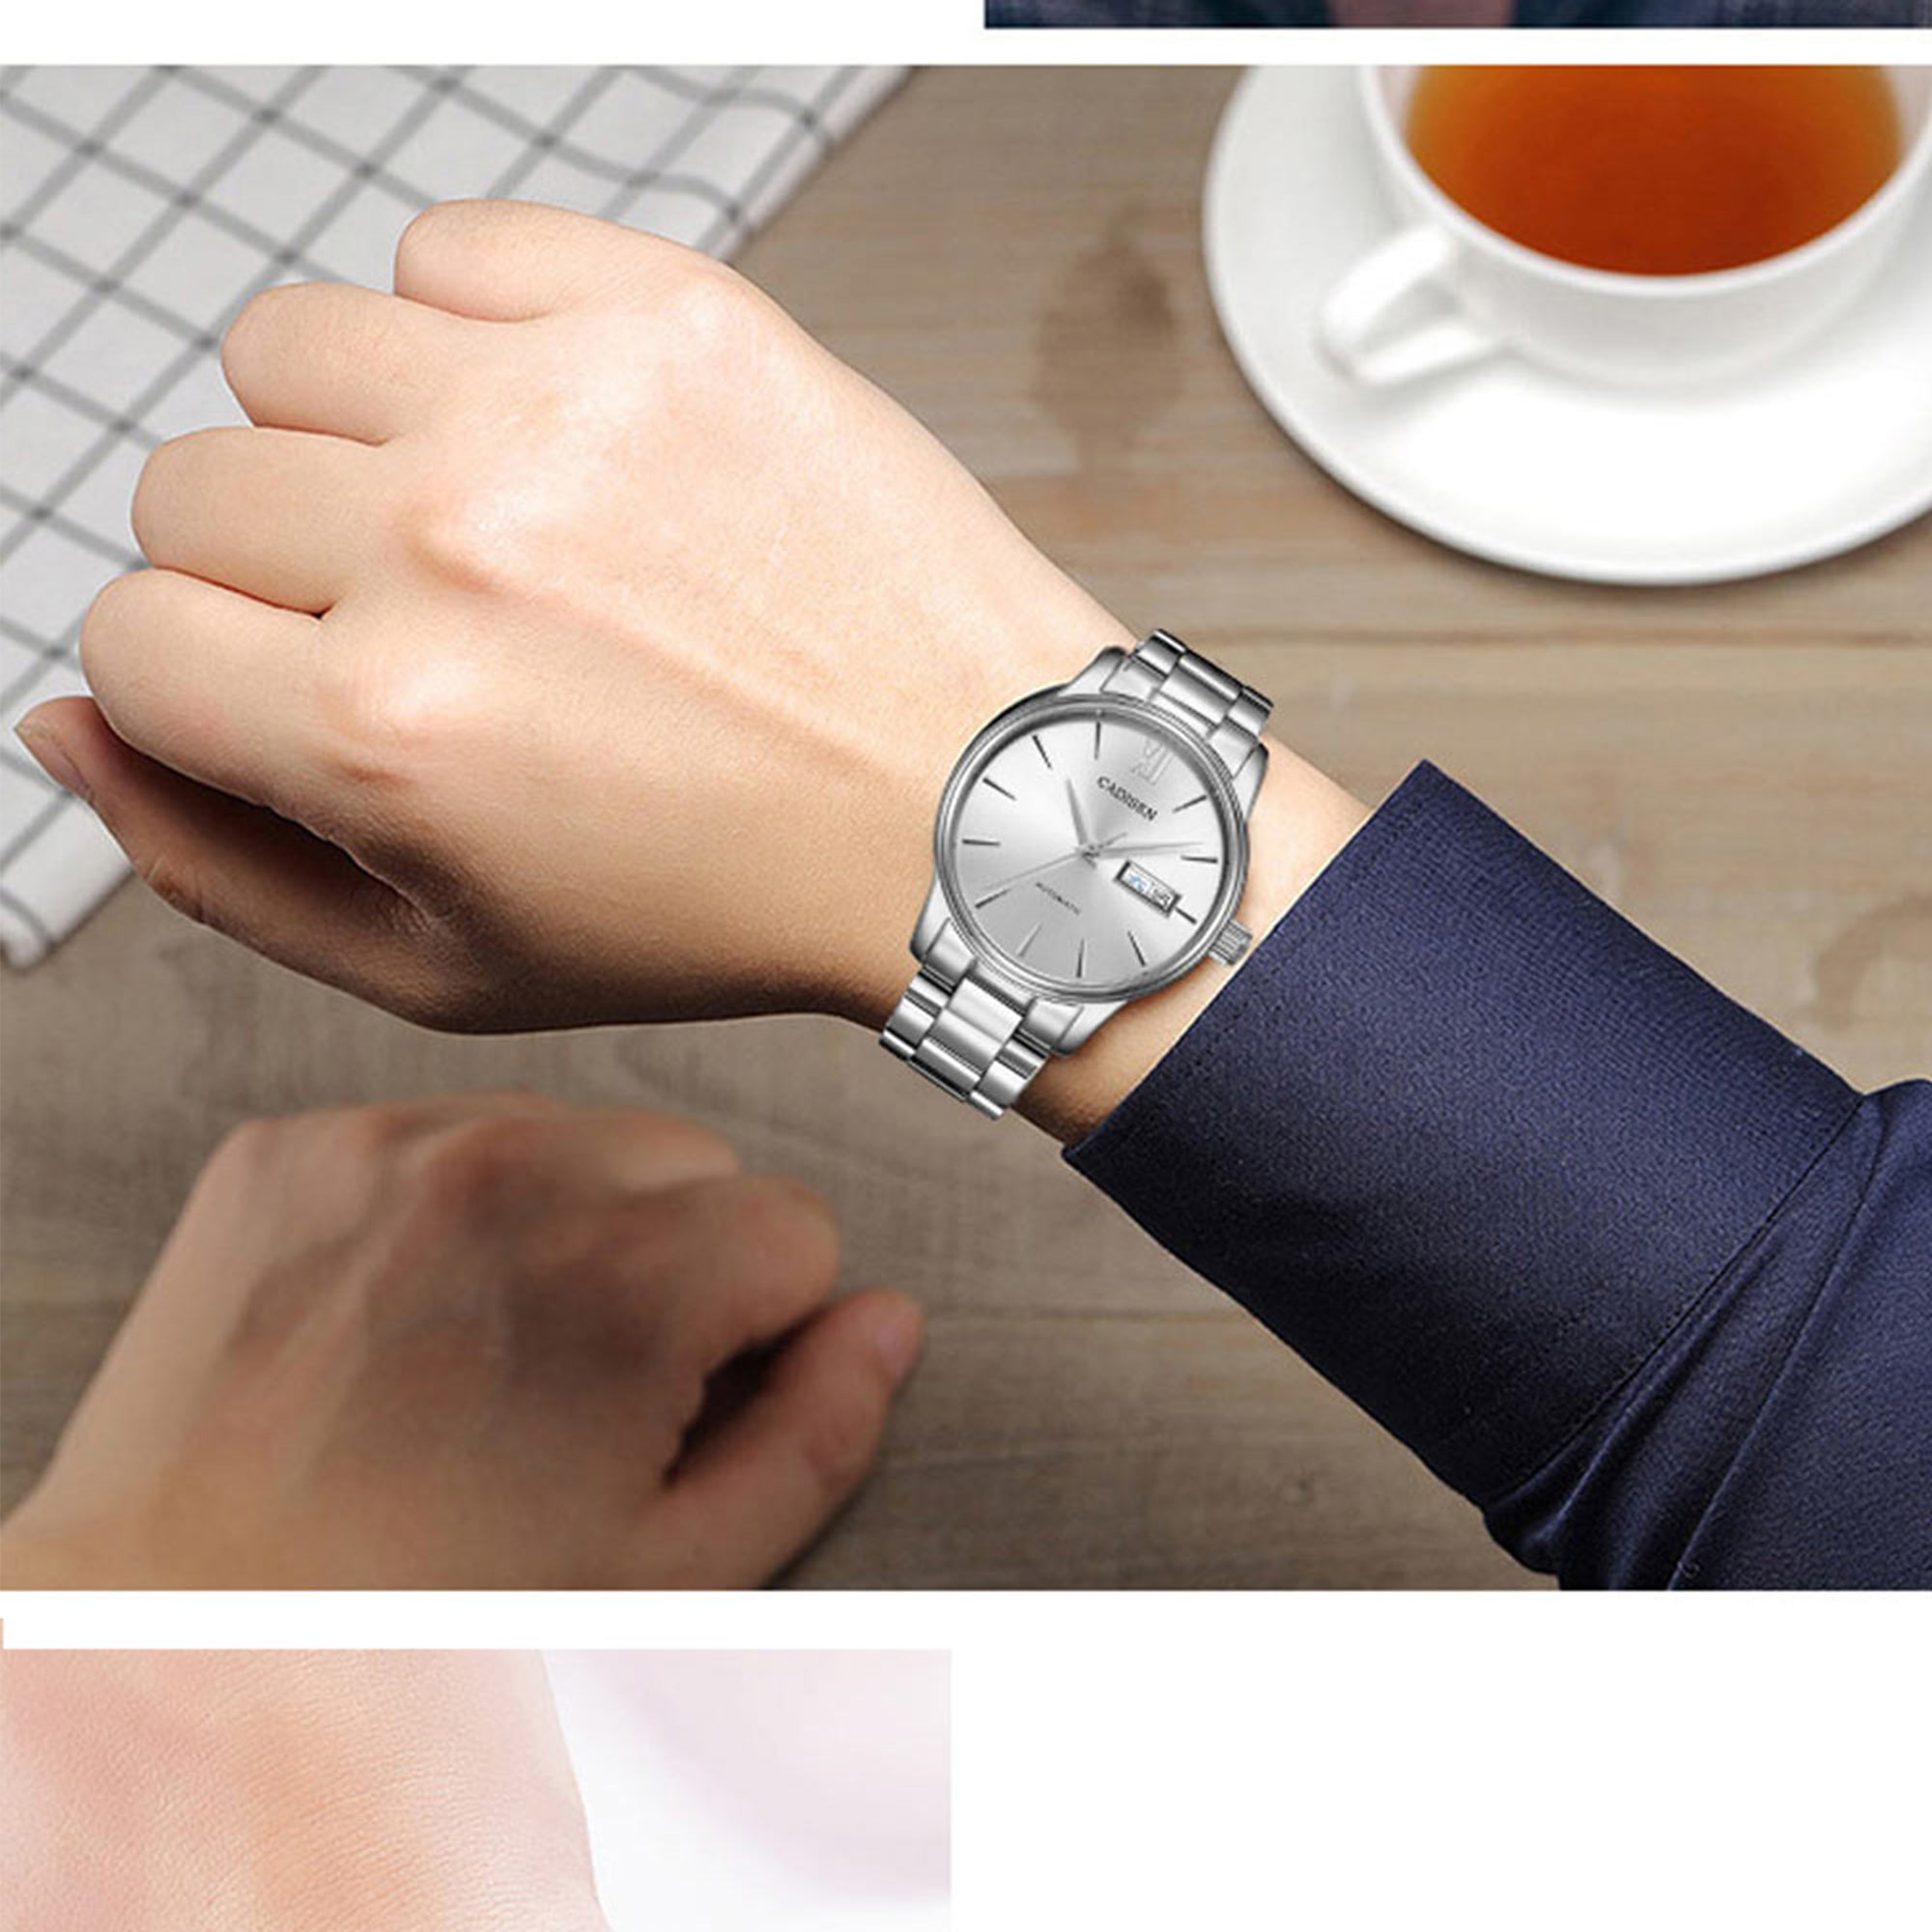 H509b760e755144dab325e1dcb8fd5bdfV CADISEN Men Watch Automatic Mechanical Watches Role Date Week Top Luxury Brand Japan NH36A Wrist watch Clock Relogio Masculino